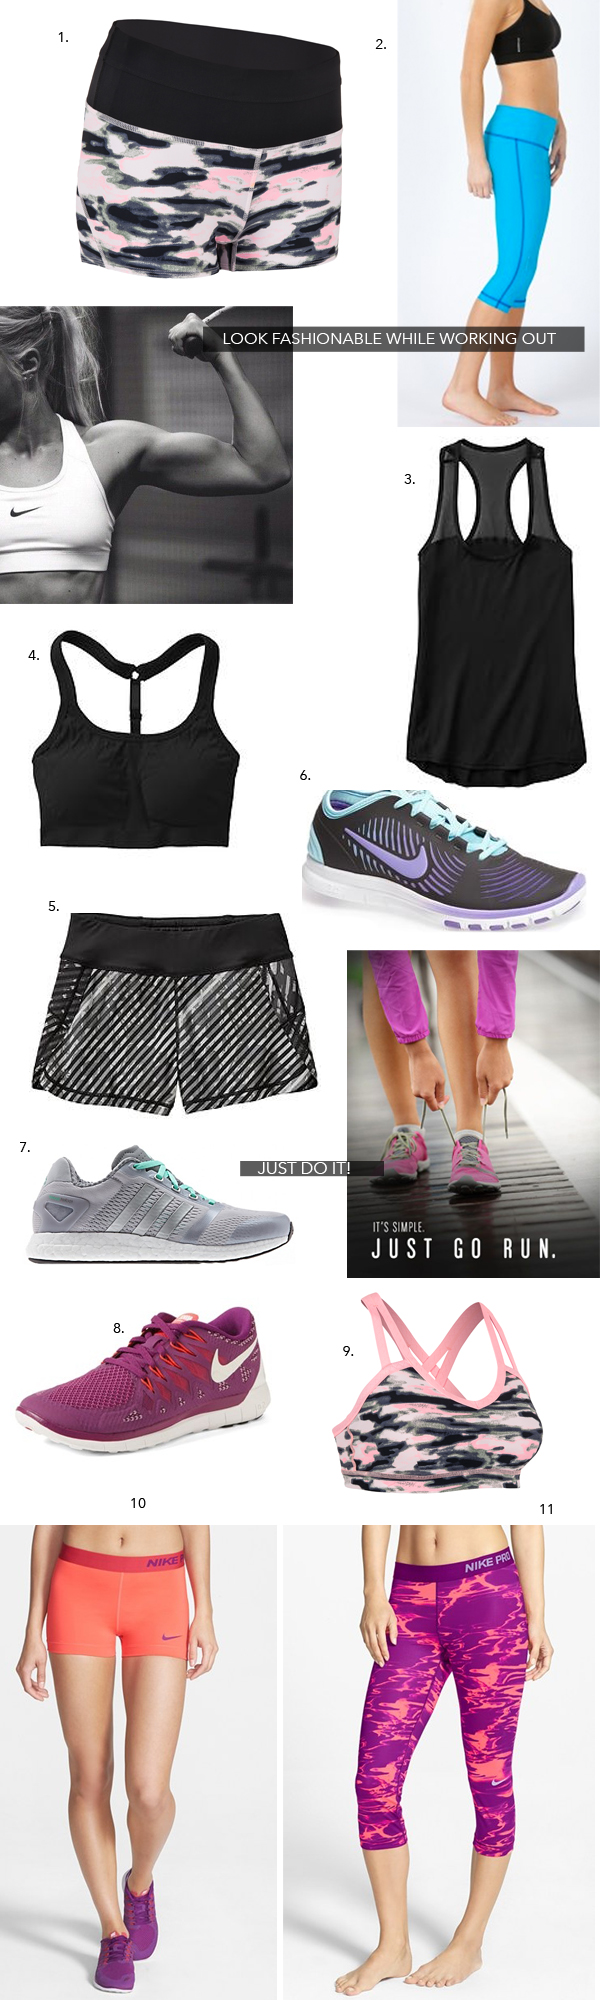 Fitness_Simply Stylist